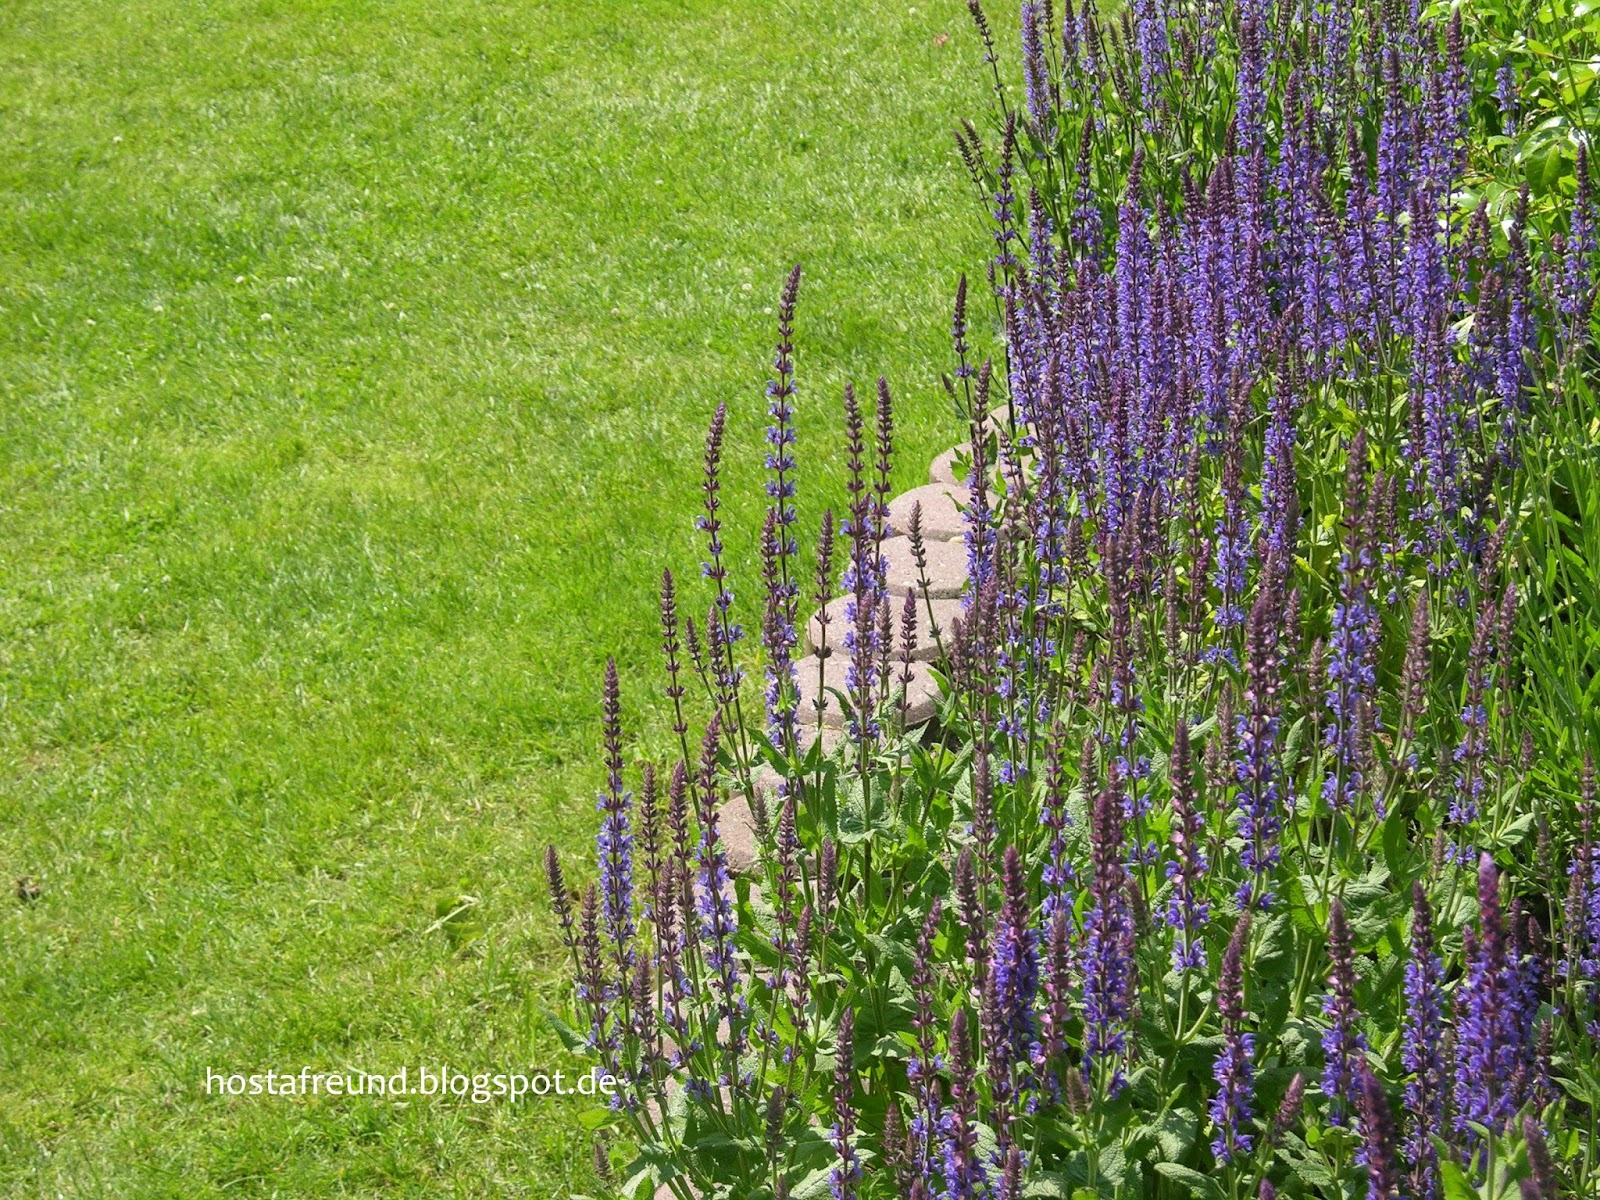 Hosta funkie fotos aus dem garten - Garten fotos ...